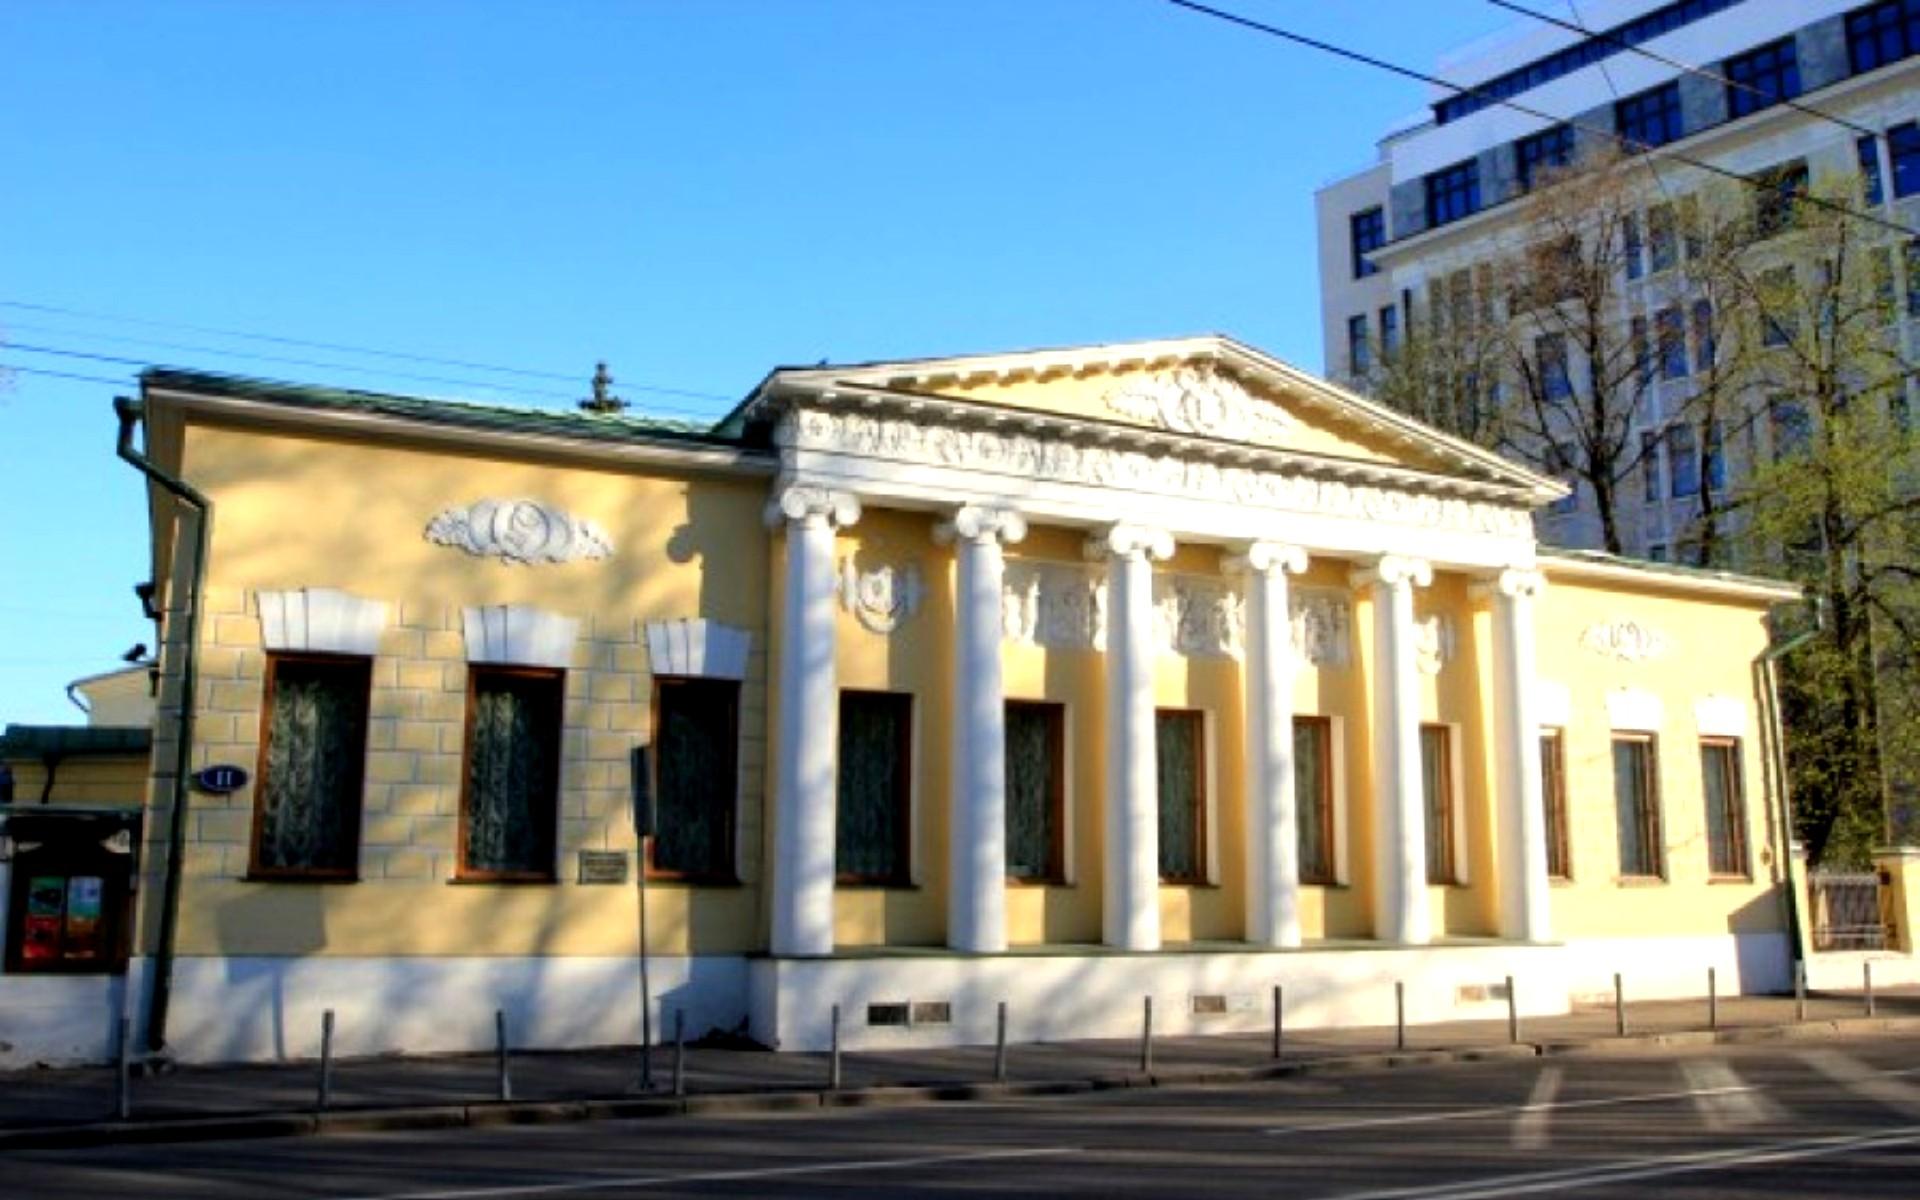 Картинка Государственный музей Л.Н ...: www.kartinki24.ru/kartinki/muzei/18558.html